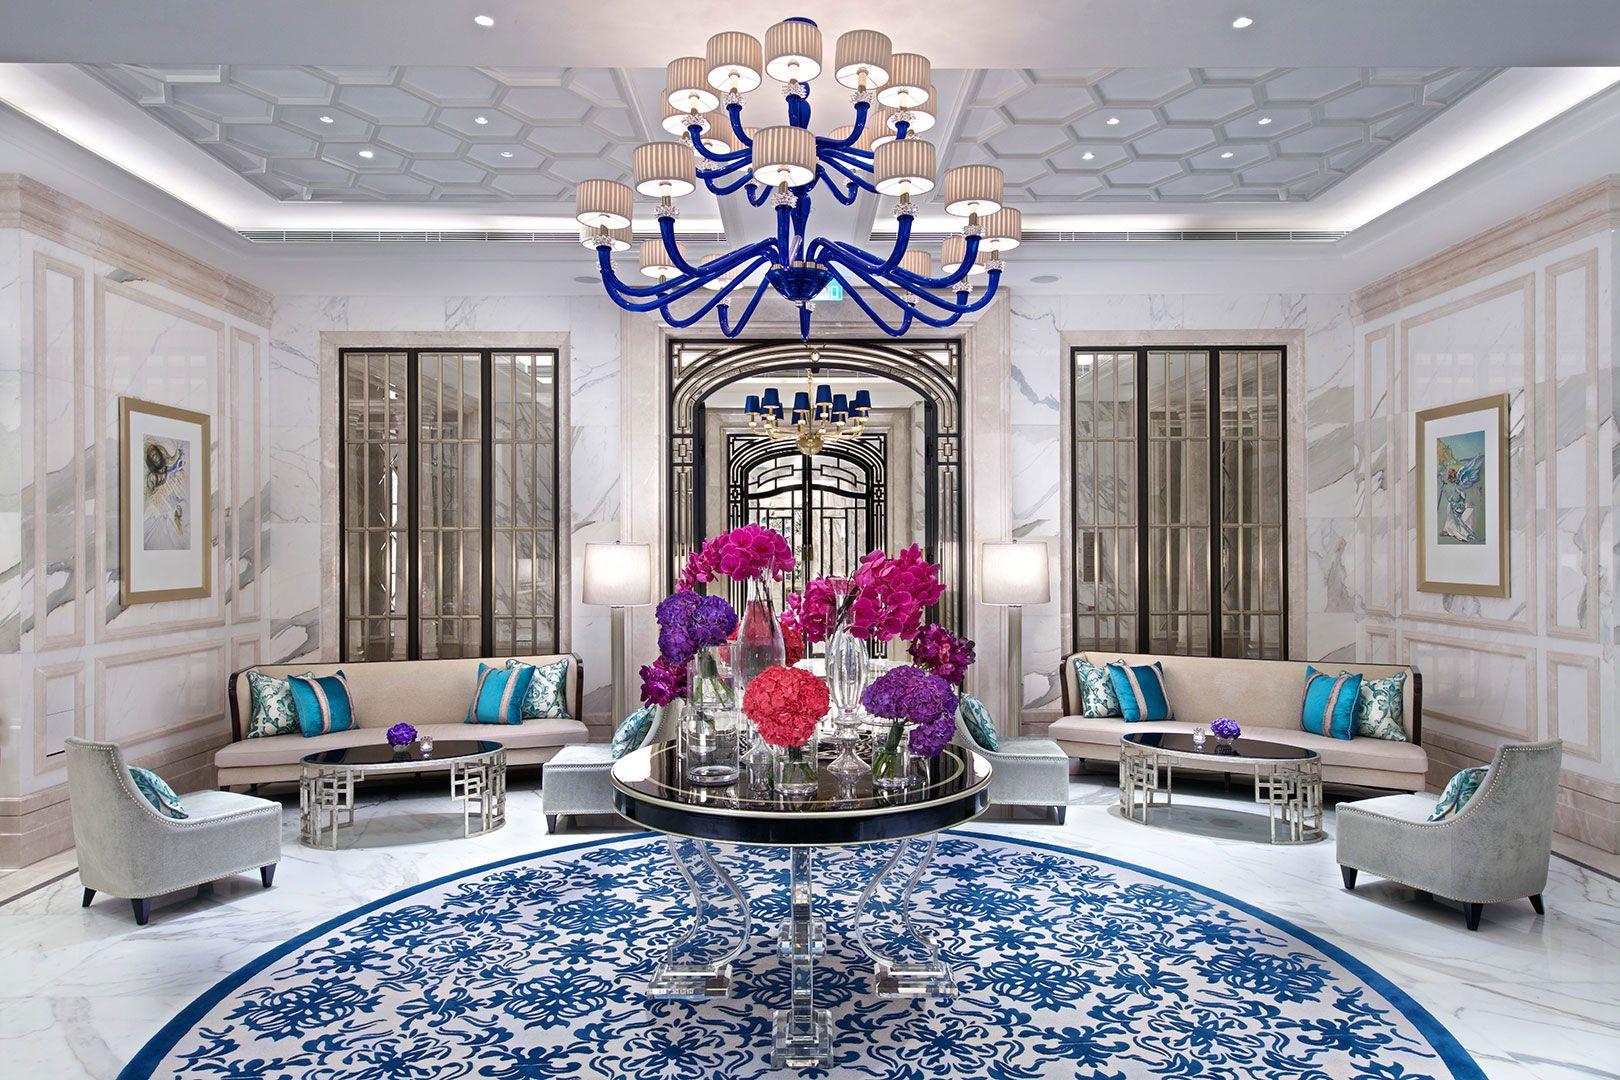 Ritz Carlton Galaxy Macau Hotel Interior Design Interior Design Magazine Interior Design Companies